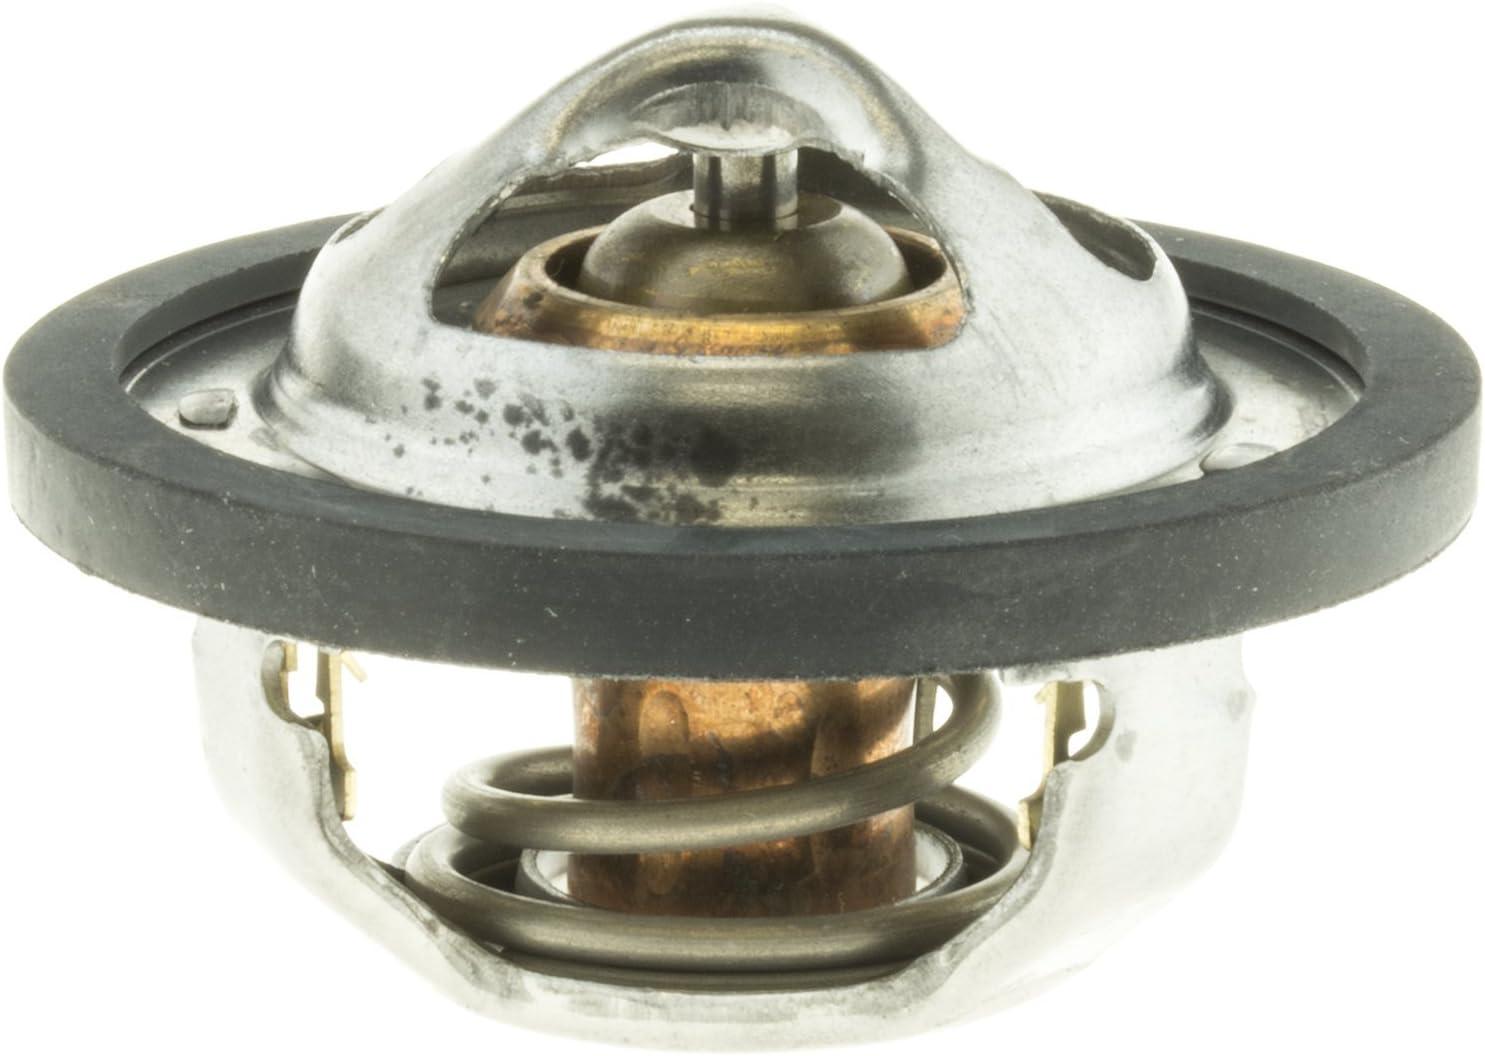 Motorad 7457-205 Fail-Safe Thermostat 205 /°F